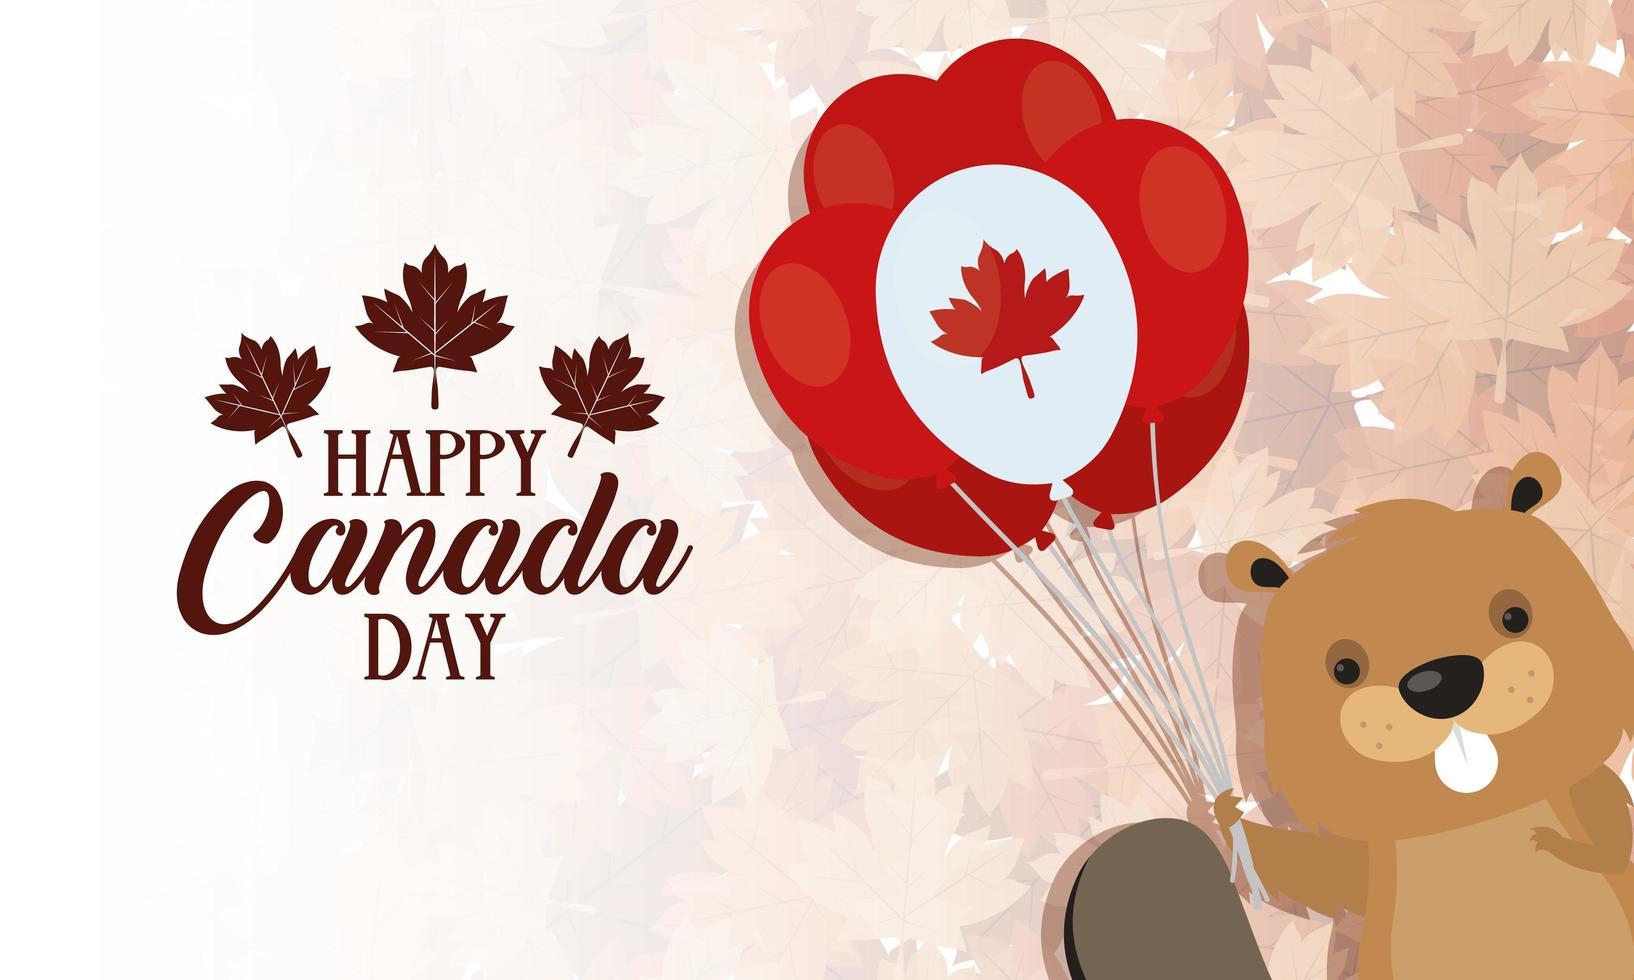 feliz día de canadá celebración banner con castor vector